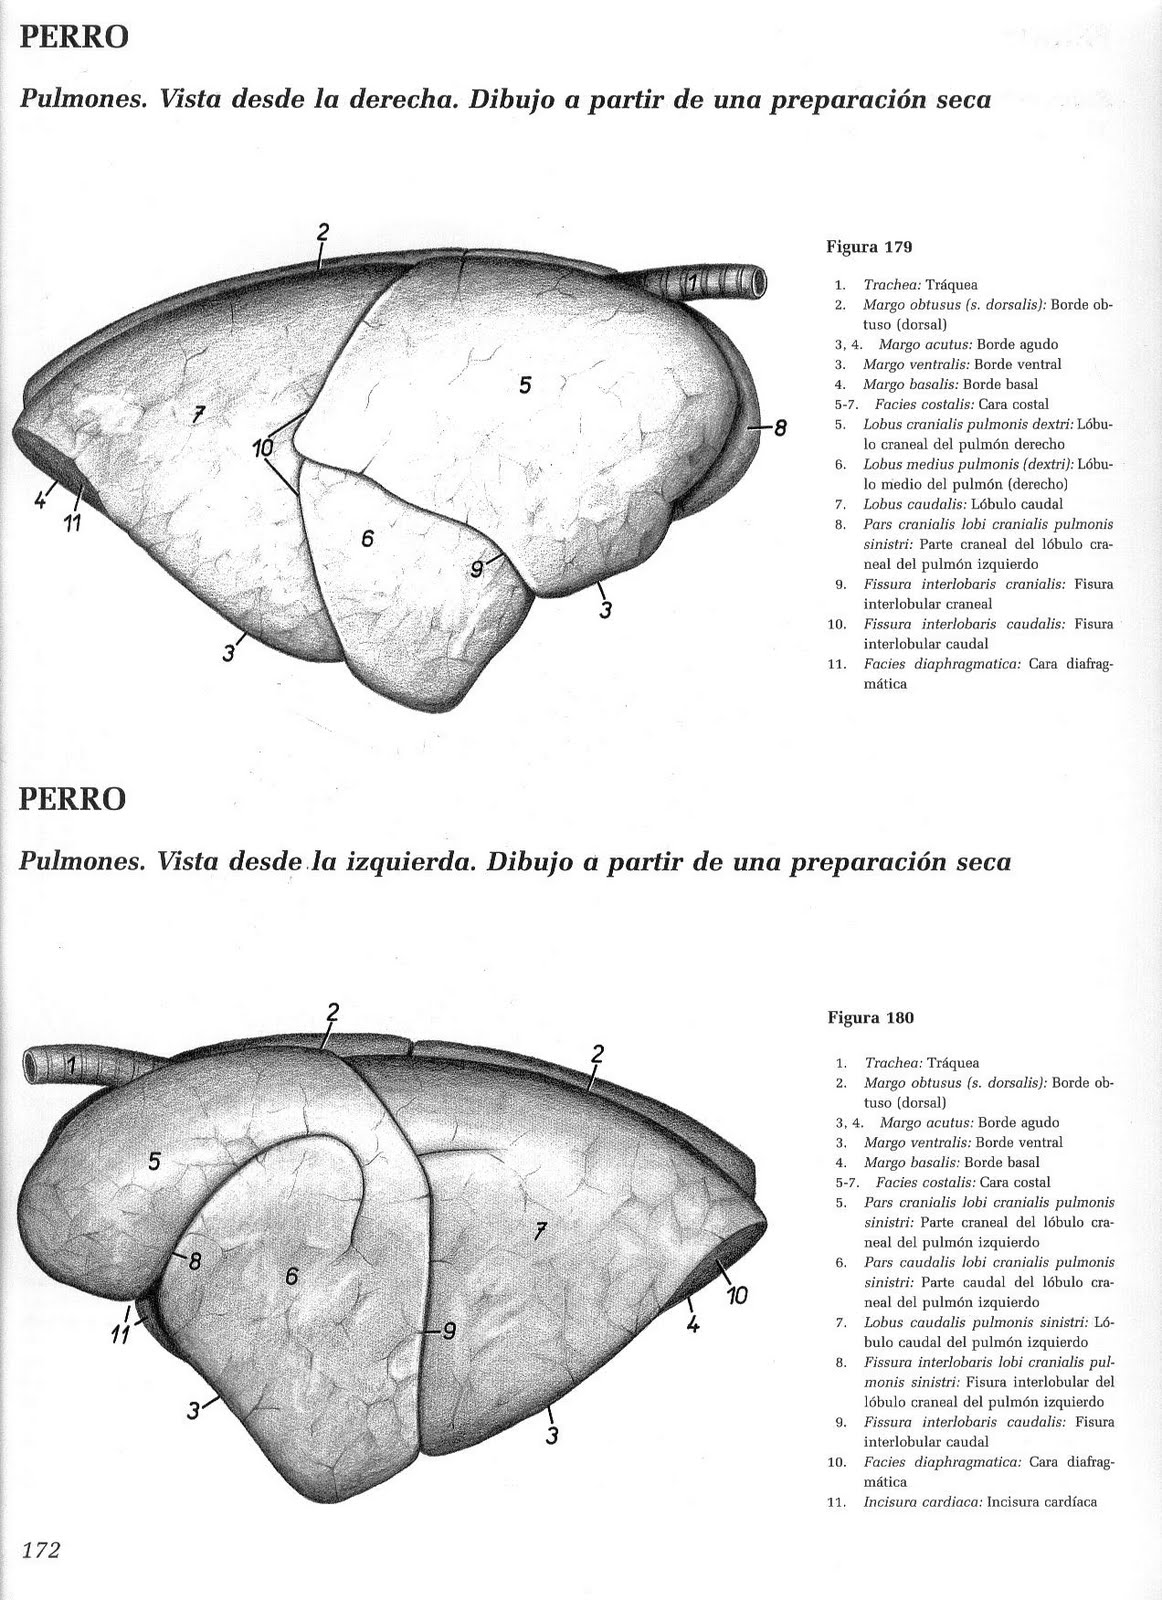 Anatomia veterinaria: material 2011 - Sistema respiratorio canino